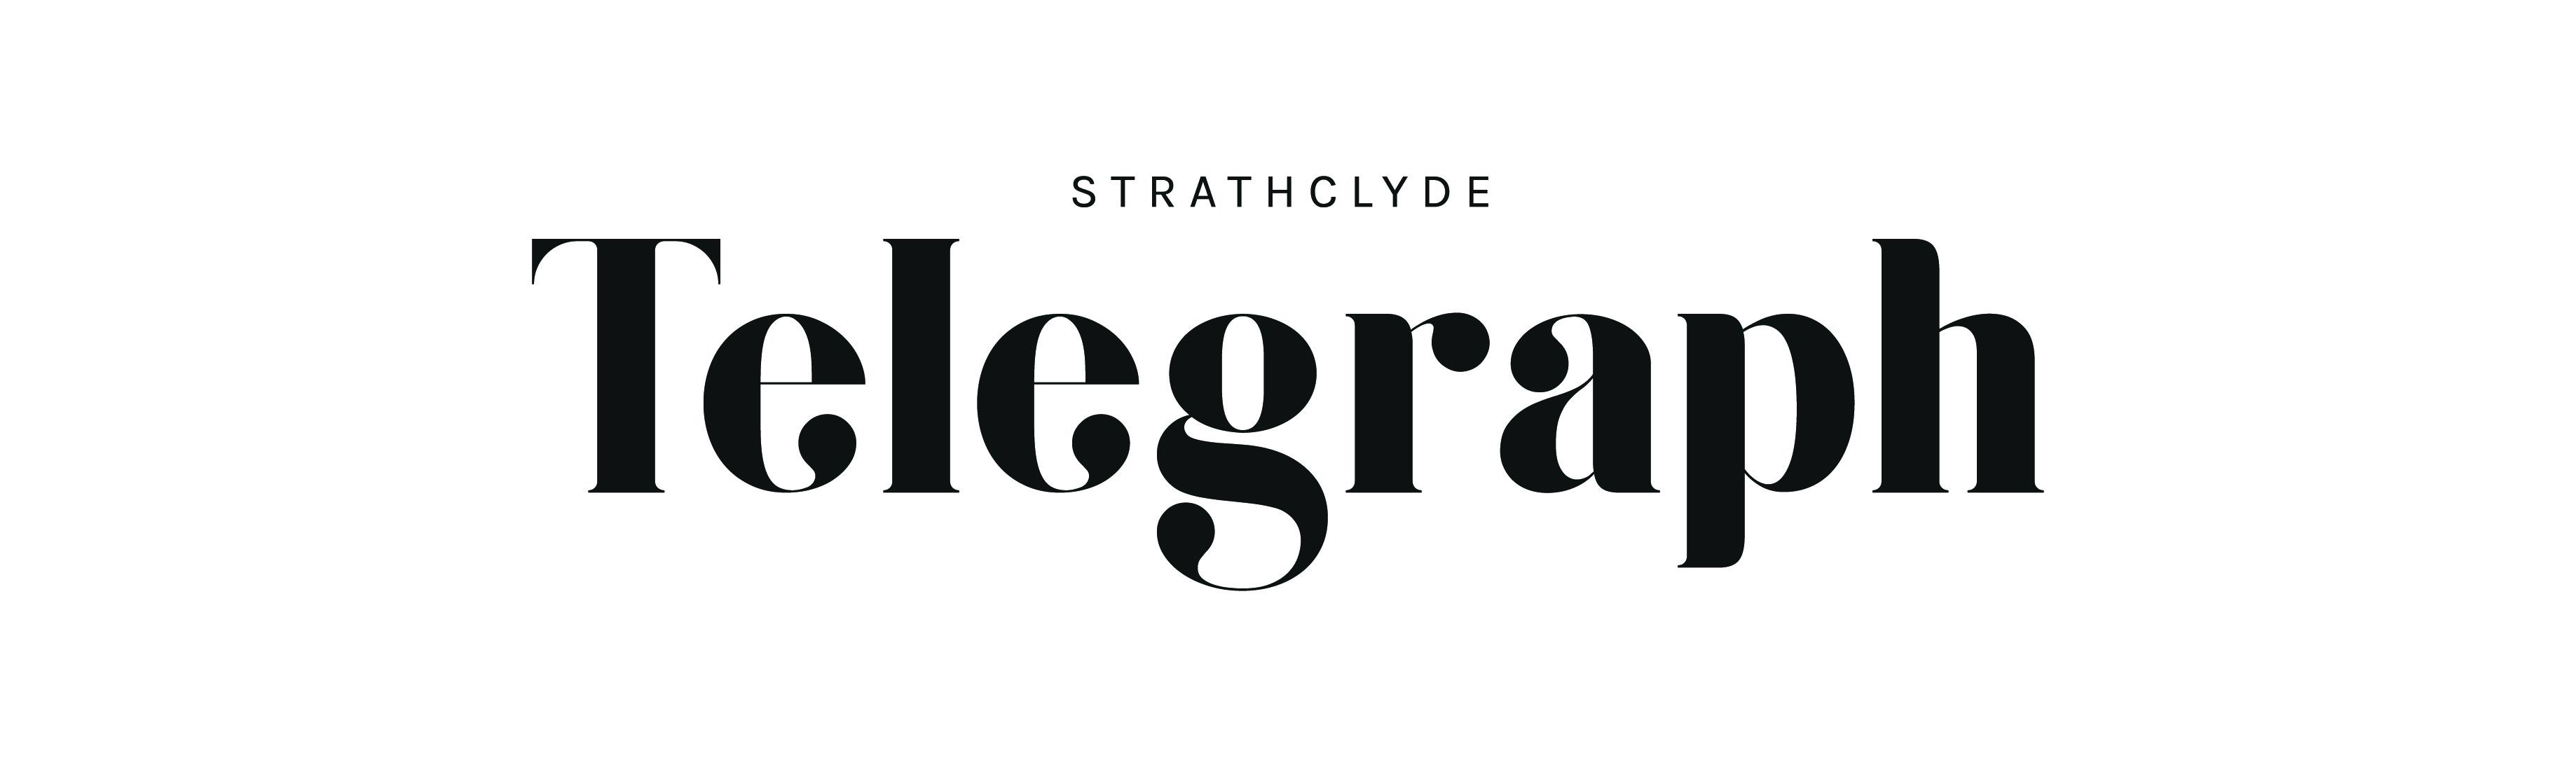 Strathclyde Telegraph – The University of Strathclyde's